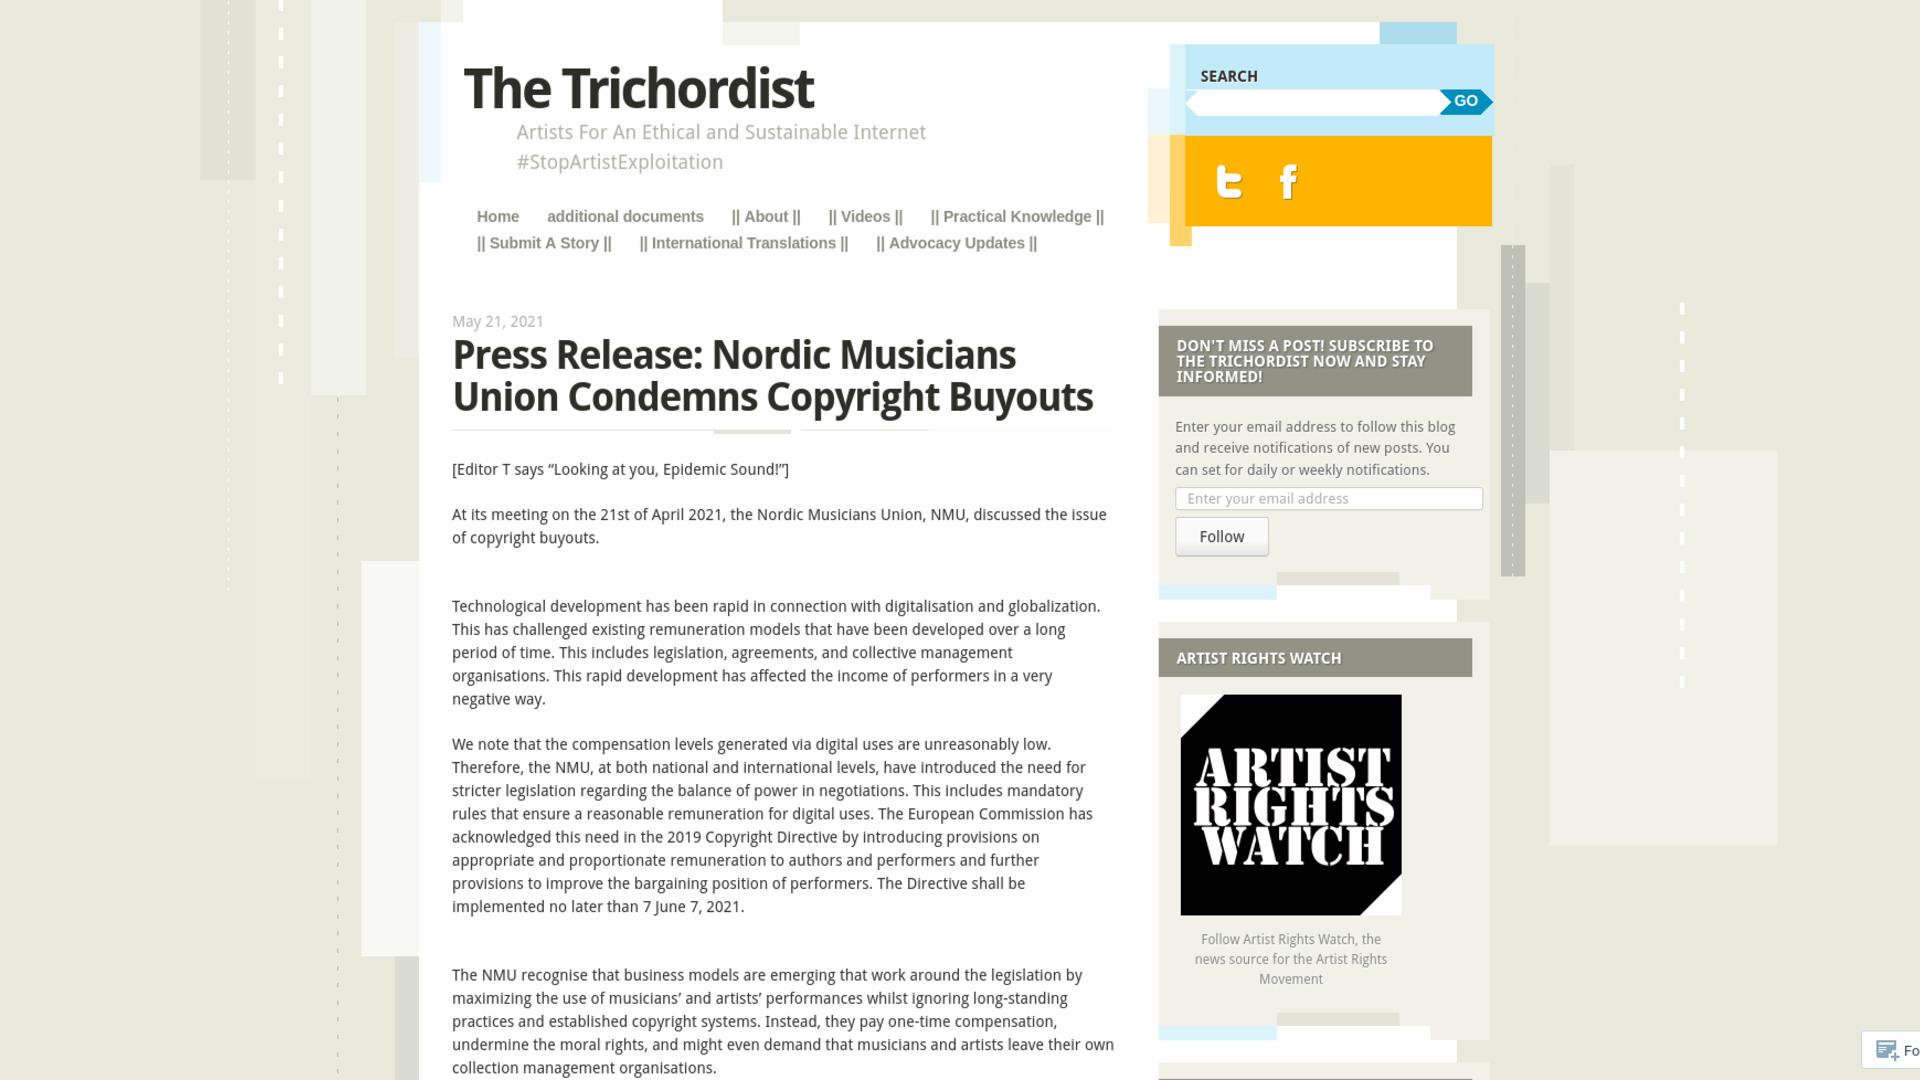 Fairness Rocks News Press Release: Nordic Musicians Union Condemns Copyright Buyouts